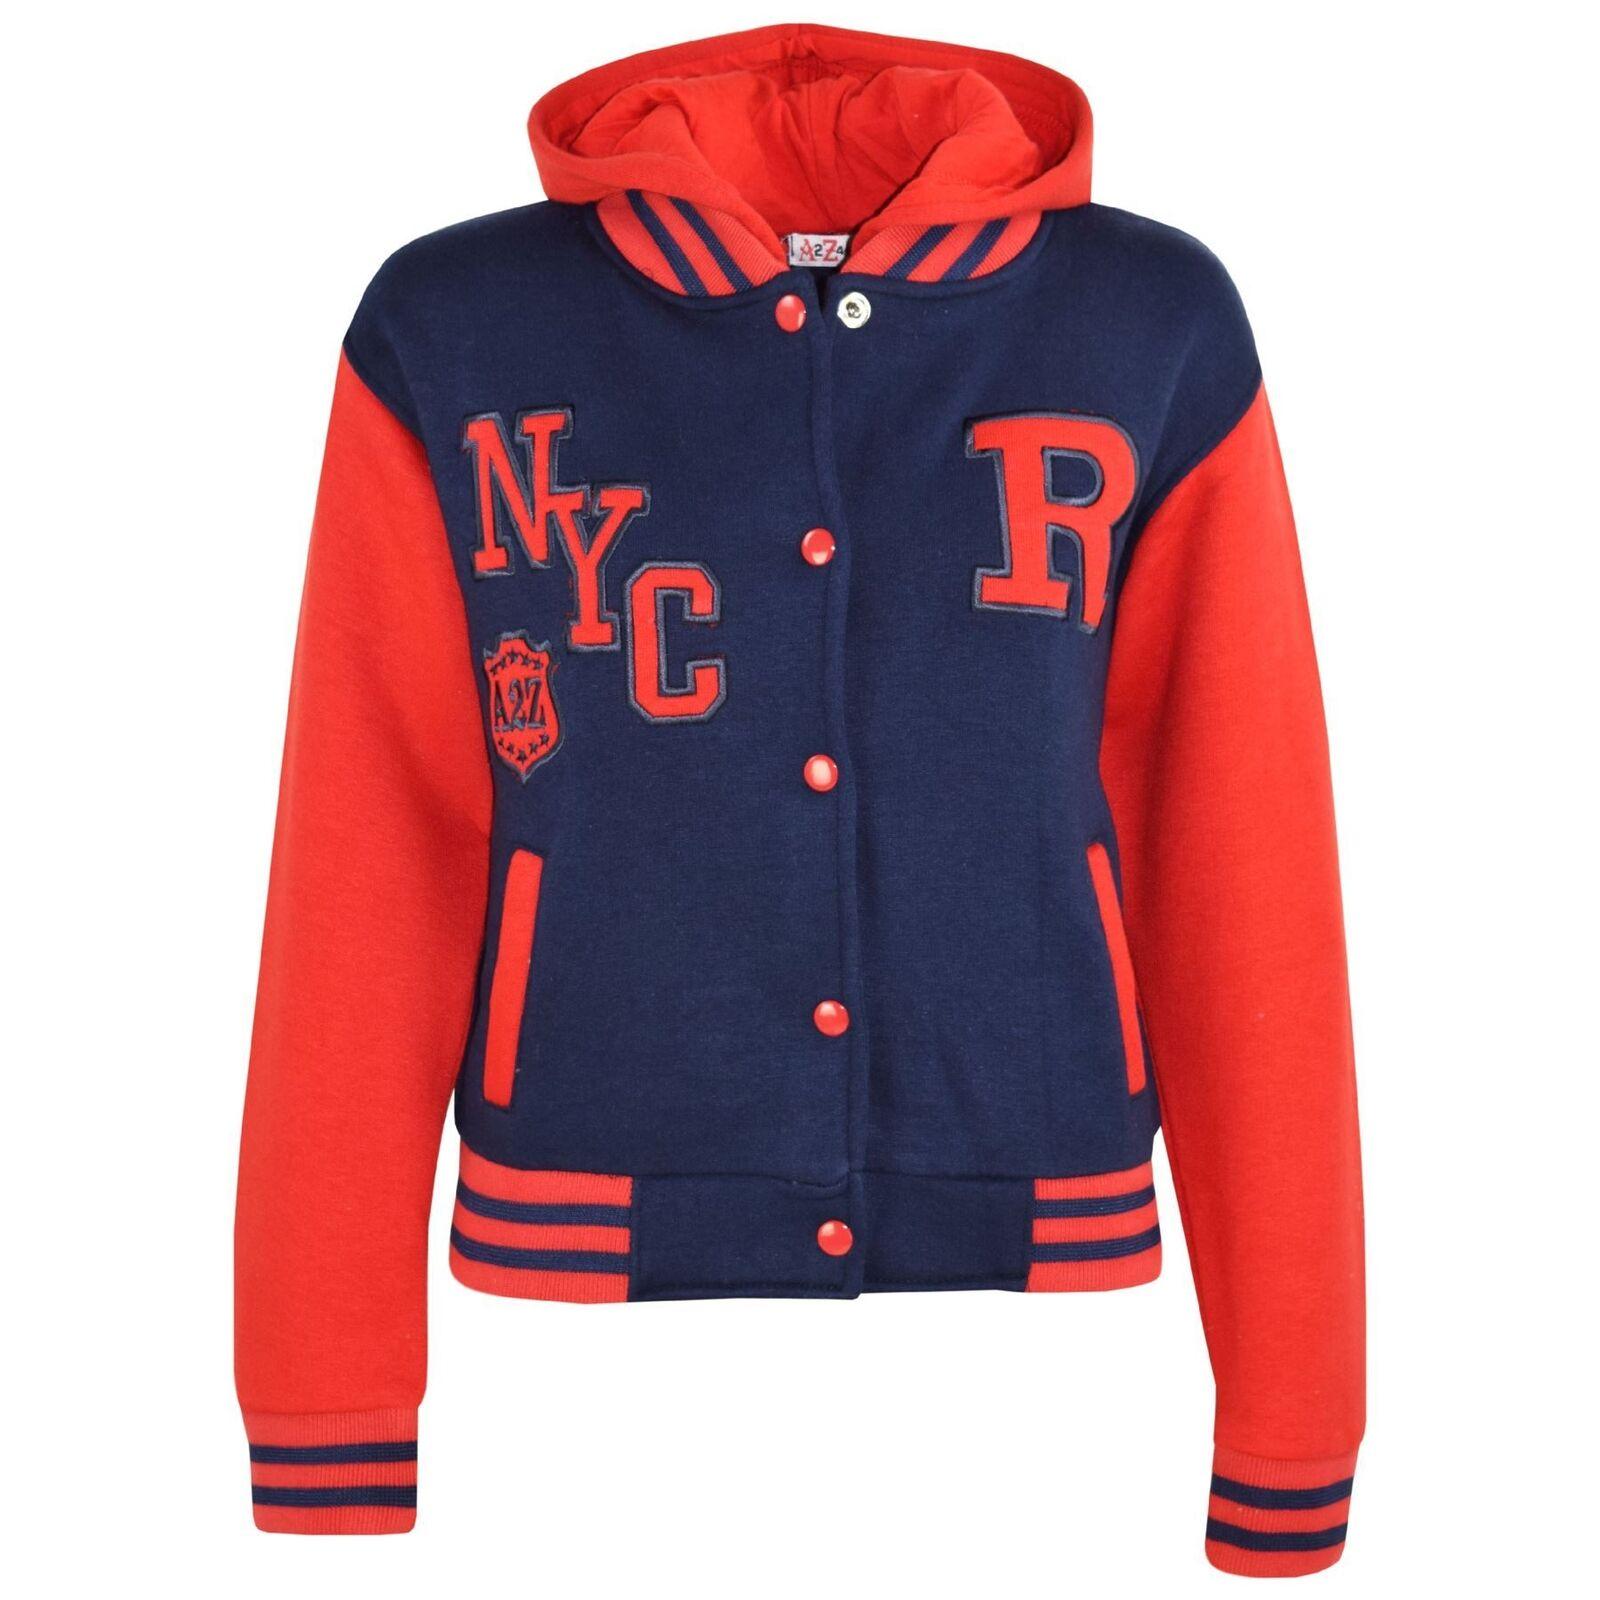 s Filles Garçons R FASHION NYC Baseball Bleu marine marine marine & rouge à capuche Vestes Varsity Hoodies fa7a73